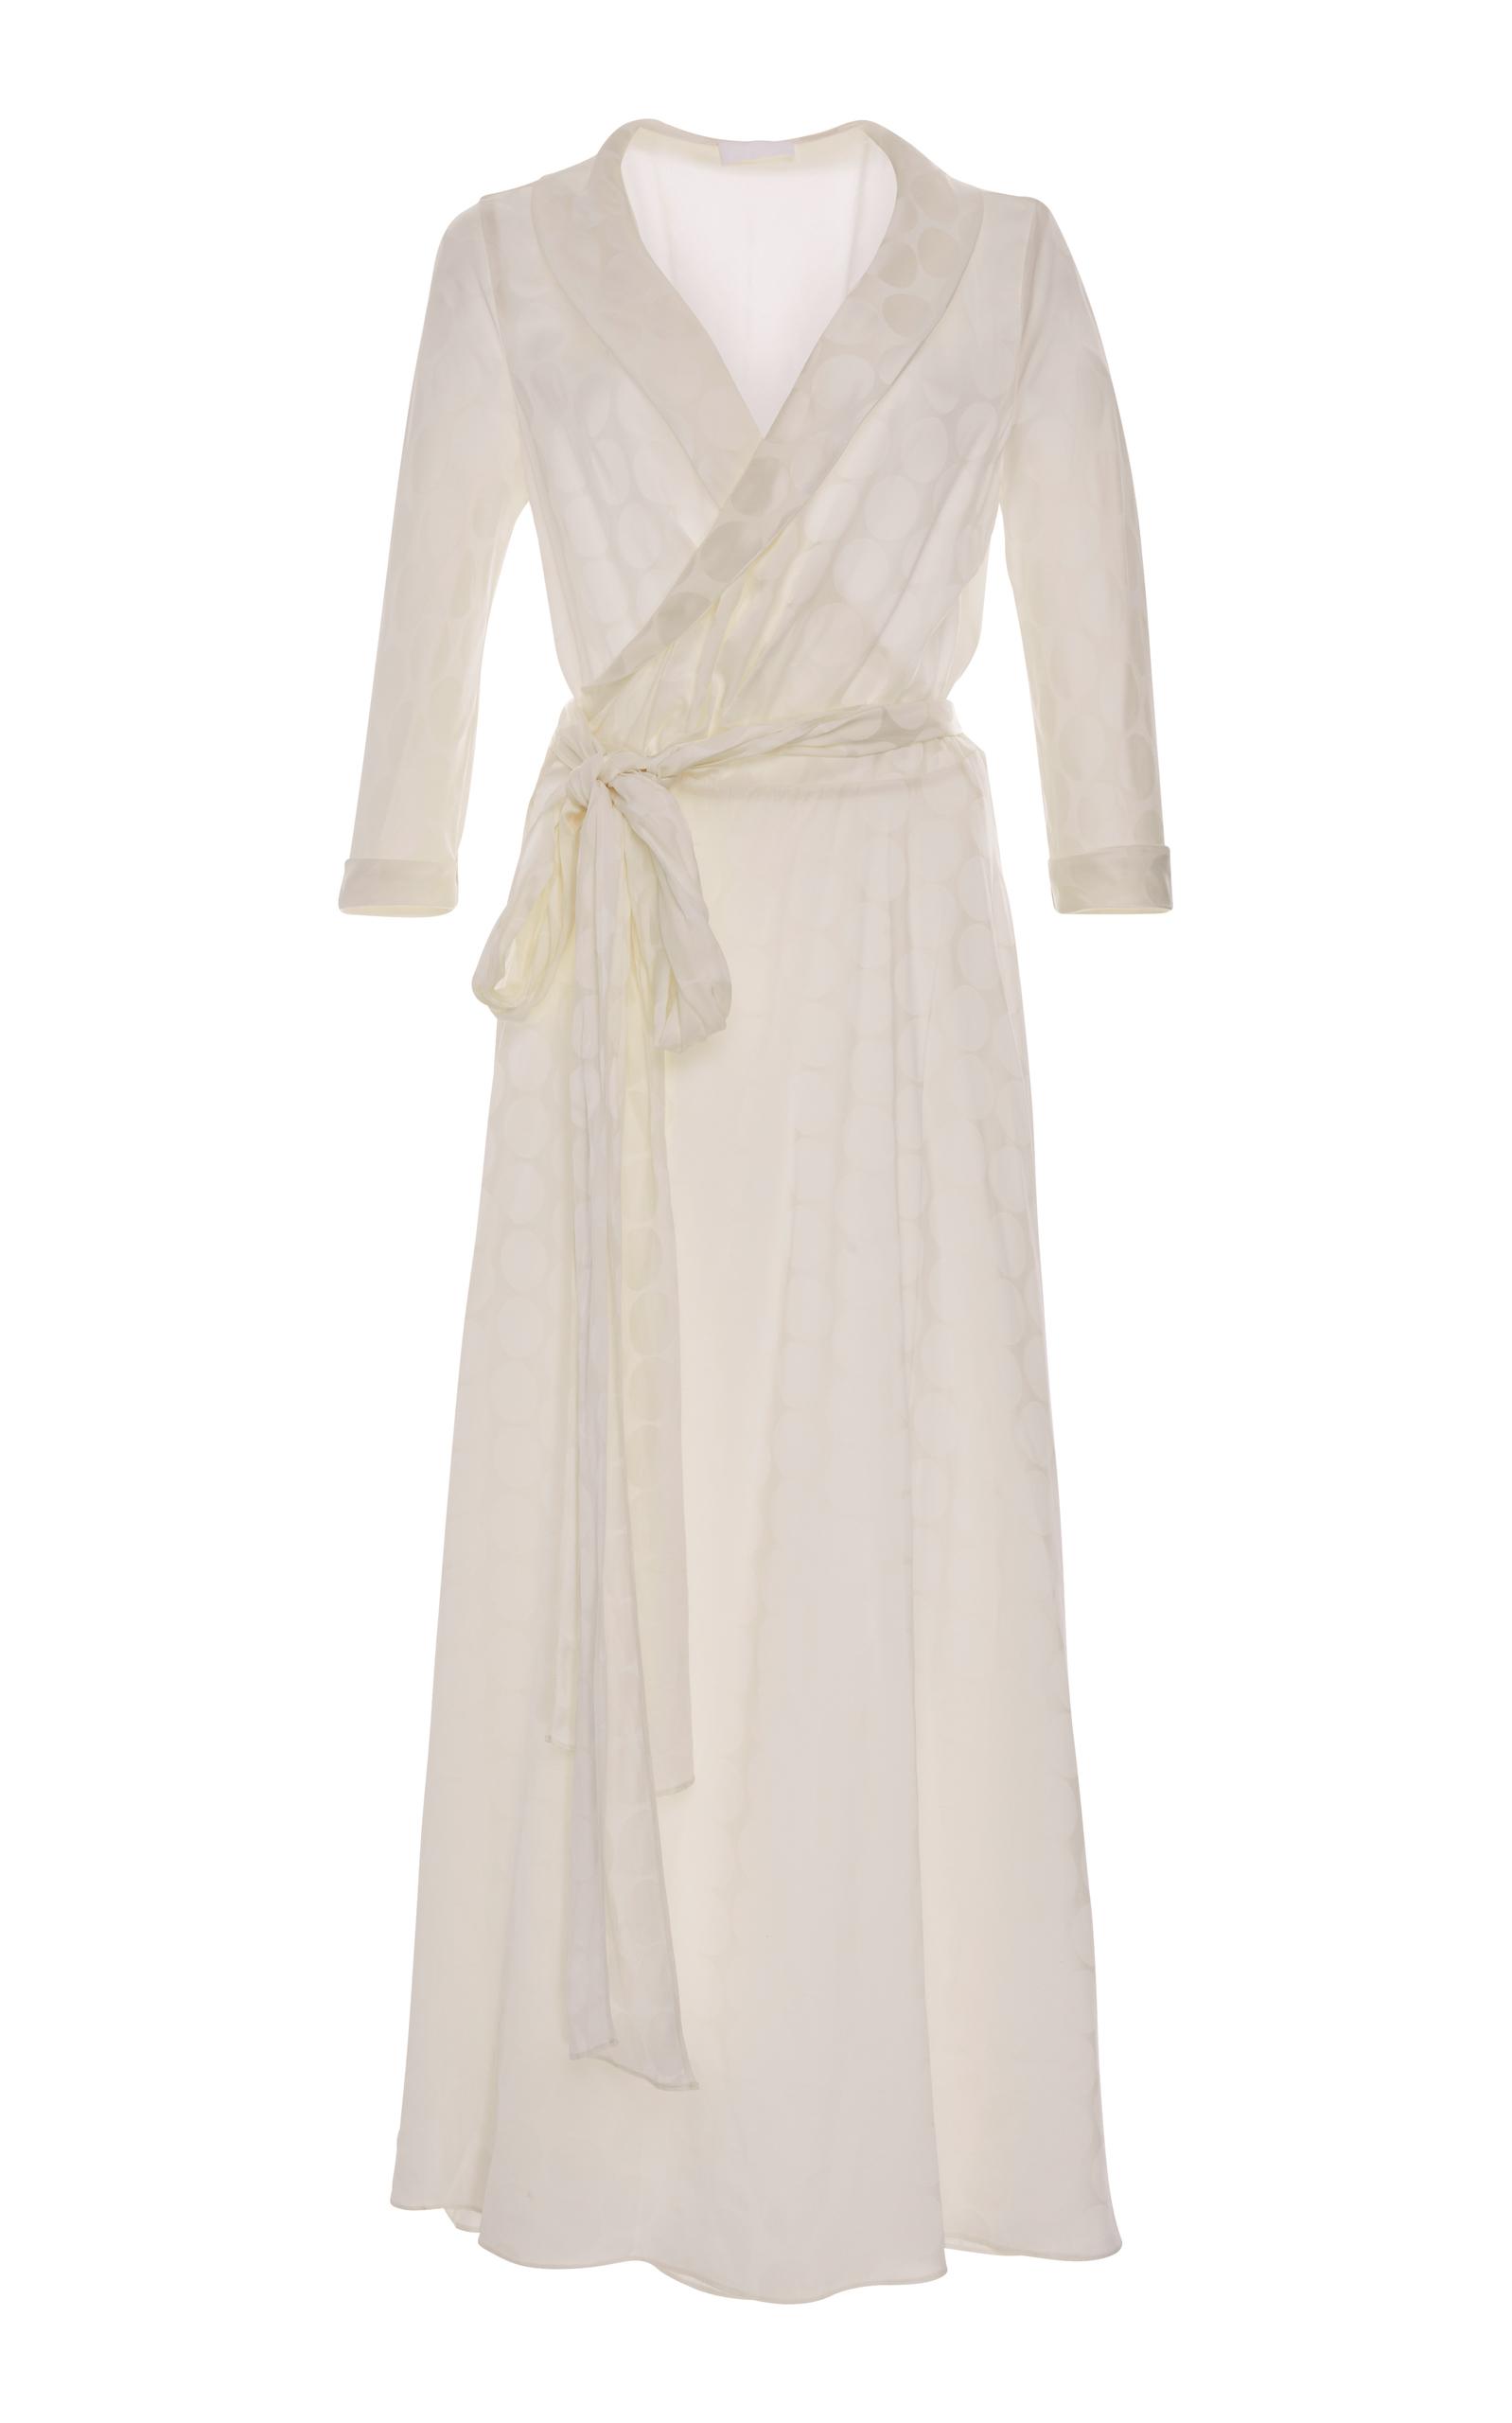 White Wrap Gown – Fashion design images